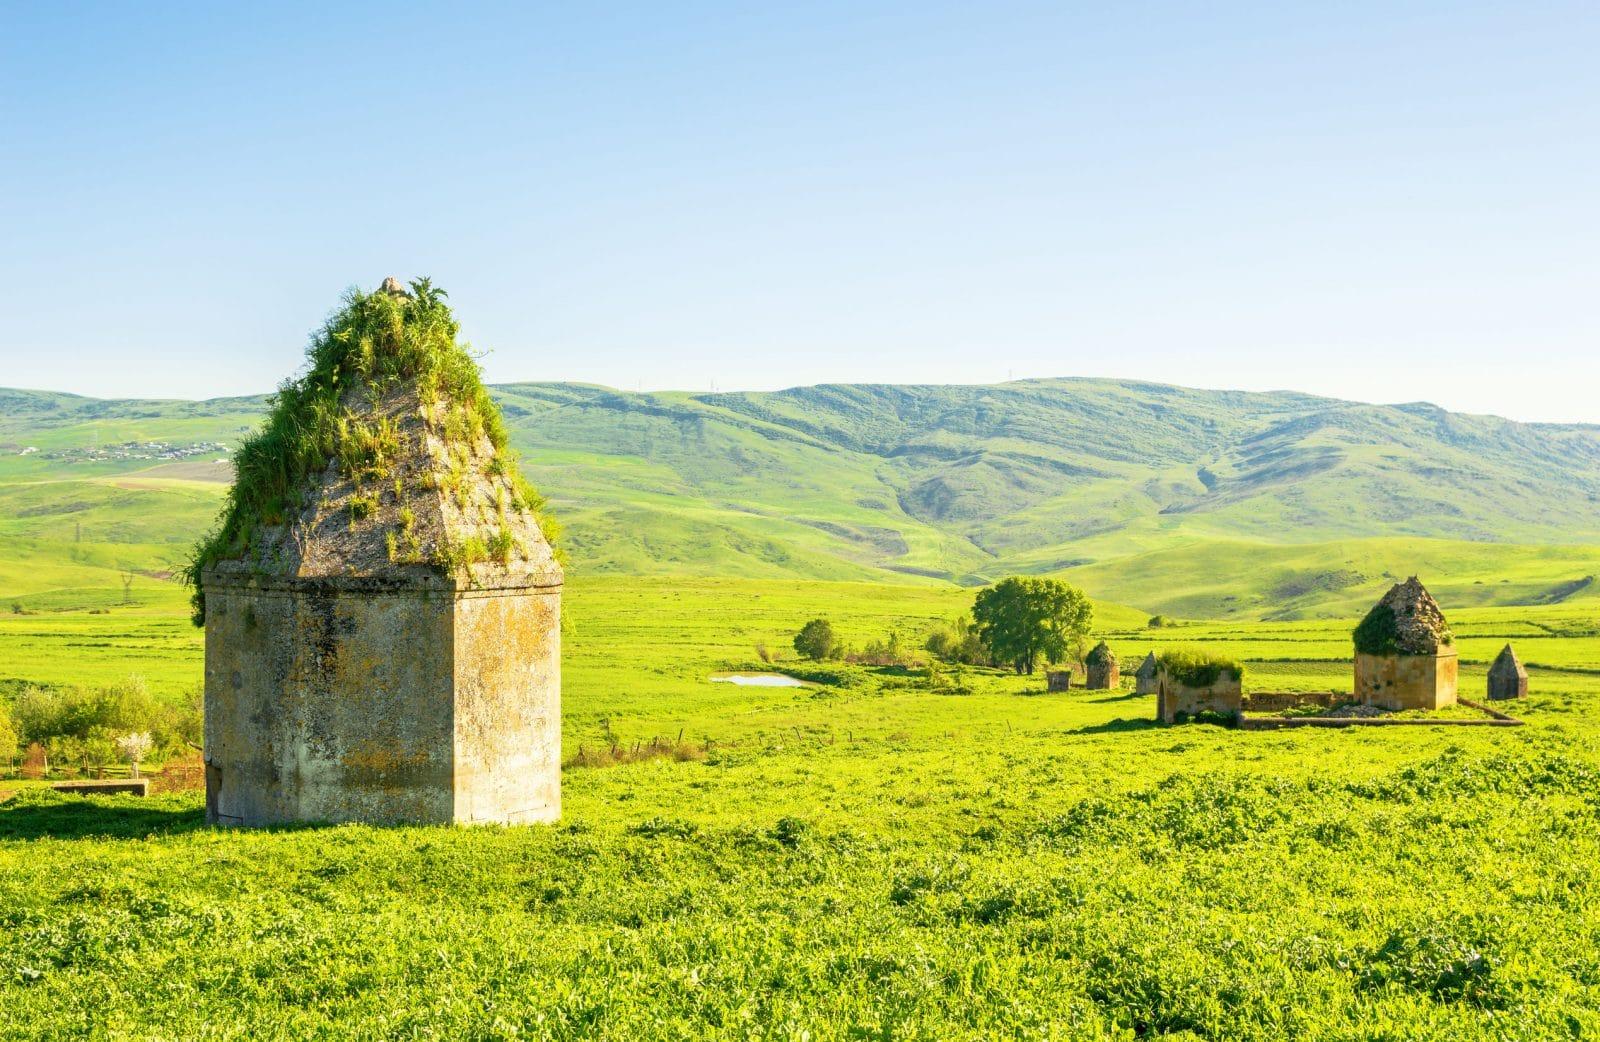 Visitar o Azerbaijão